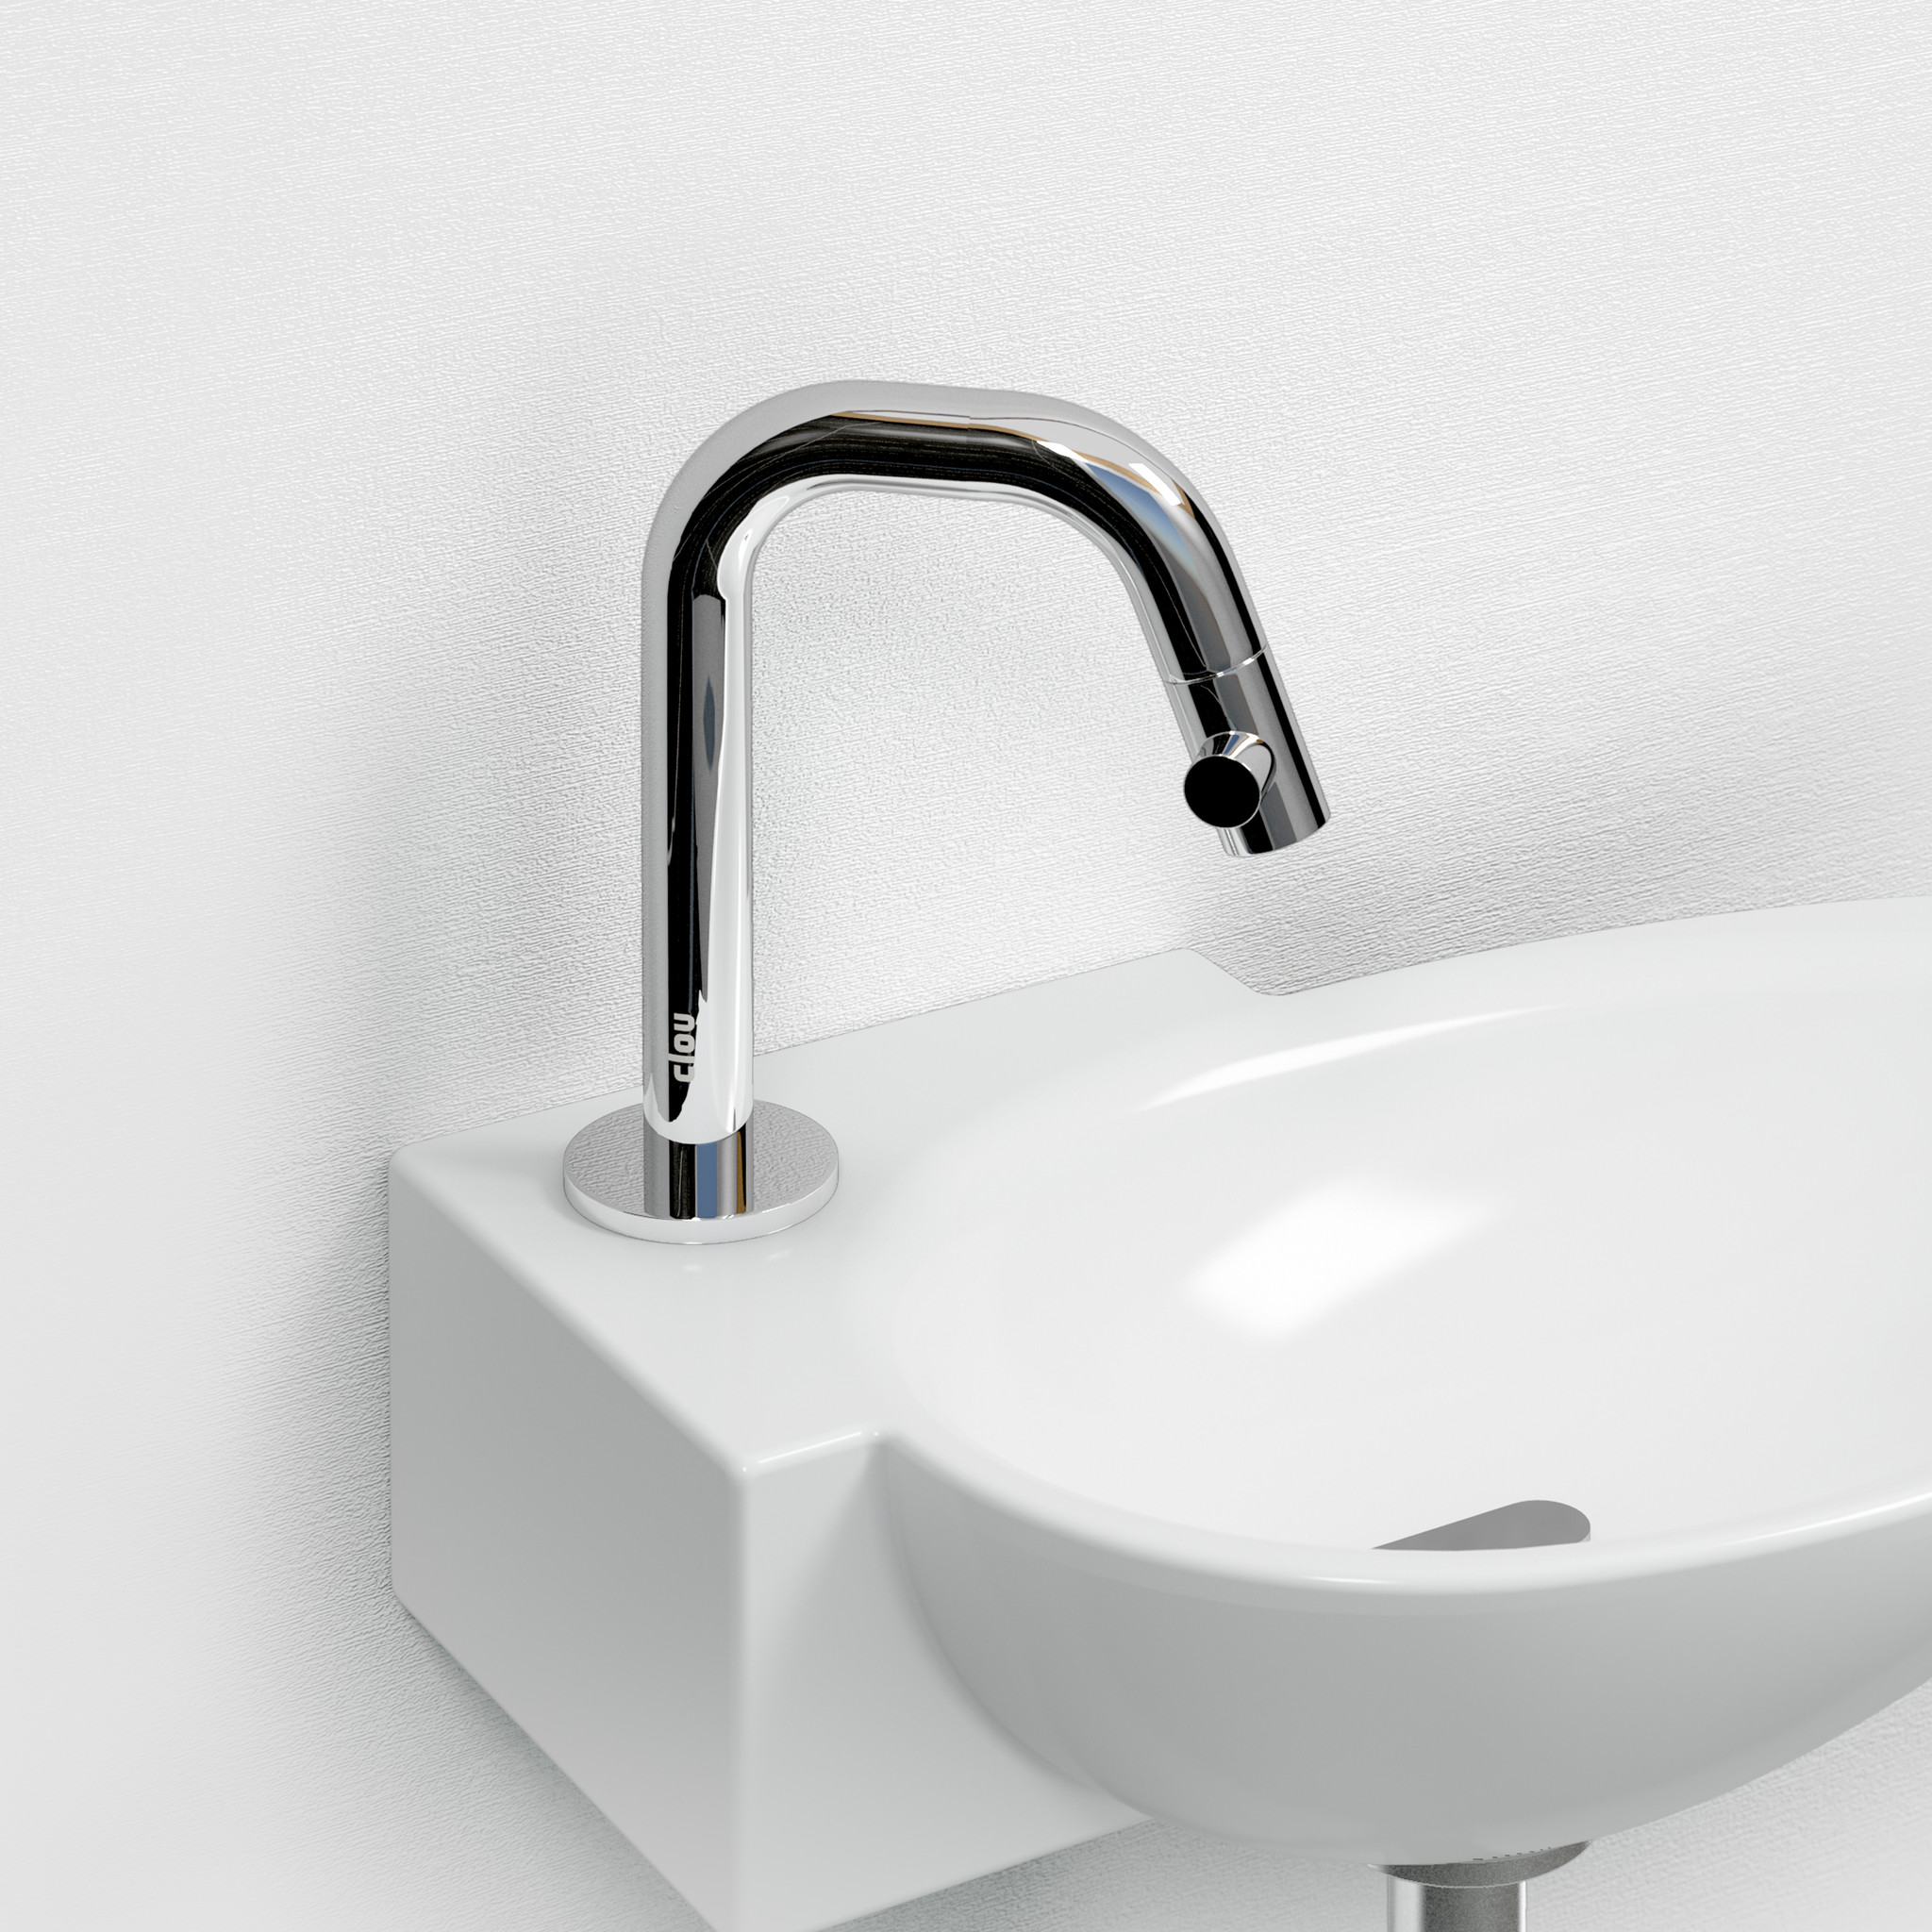 Kaldur robinet eau froide